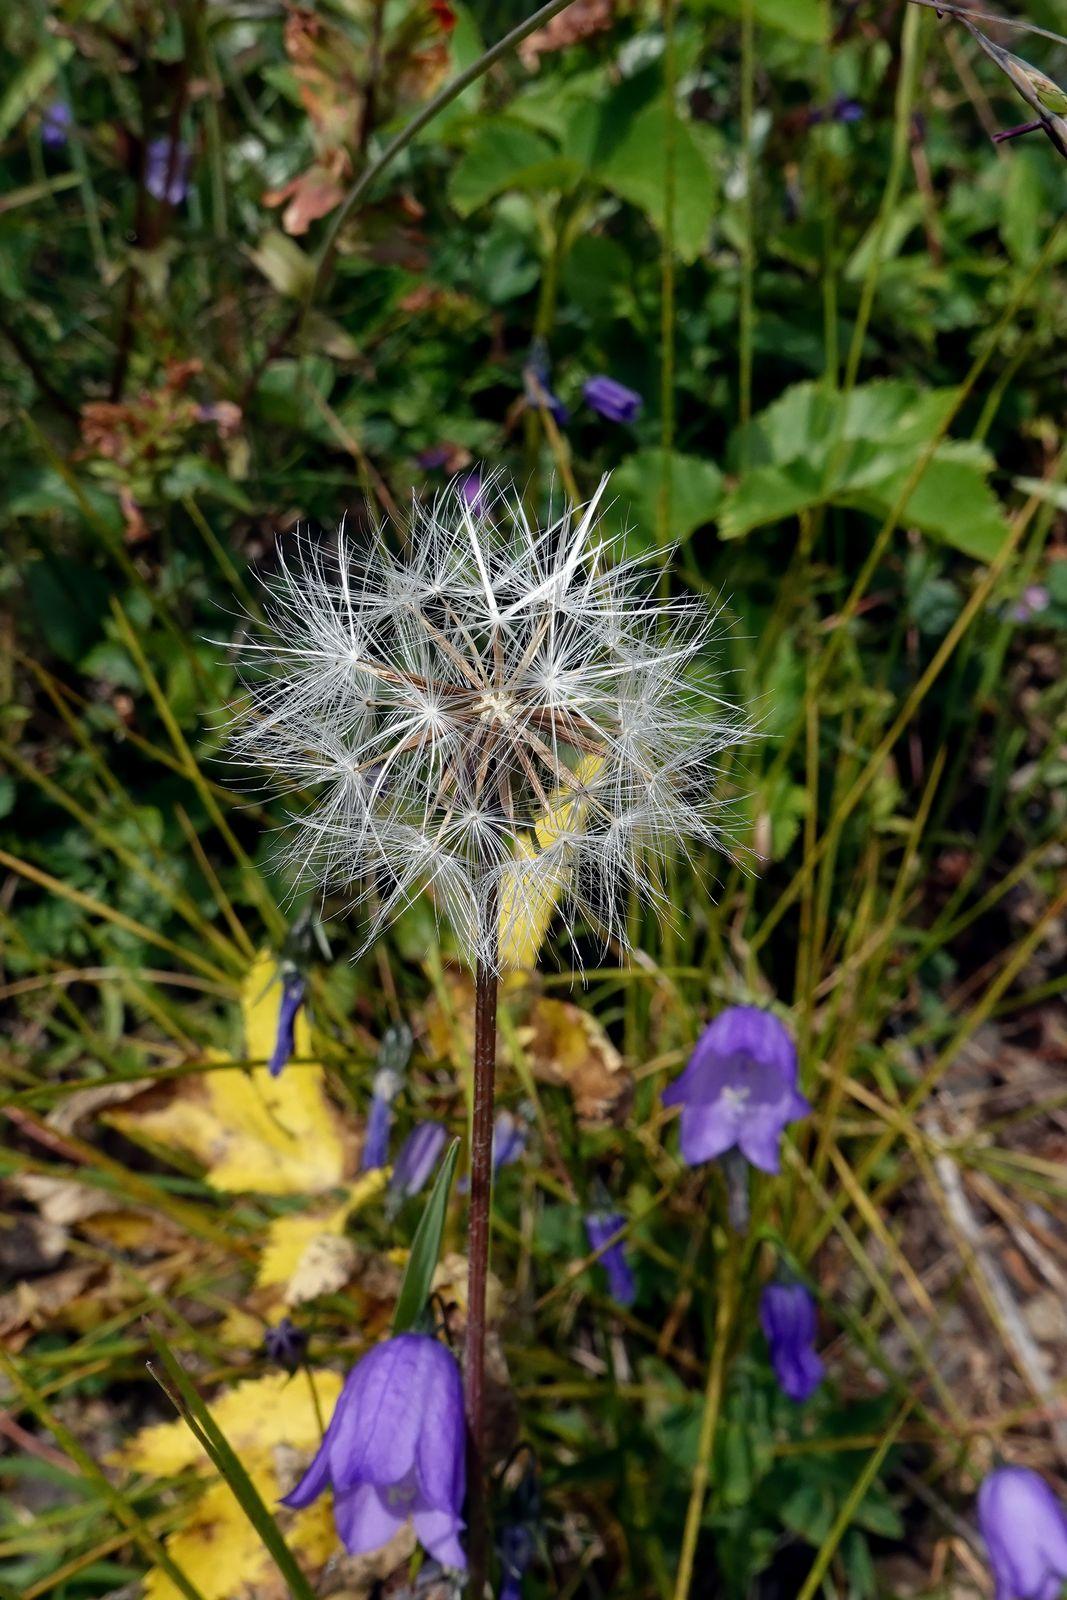 I like the dry flower puff-ball